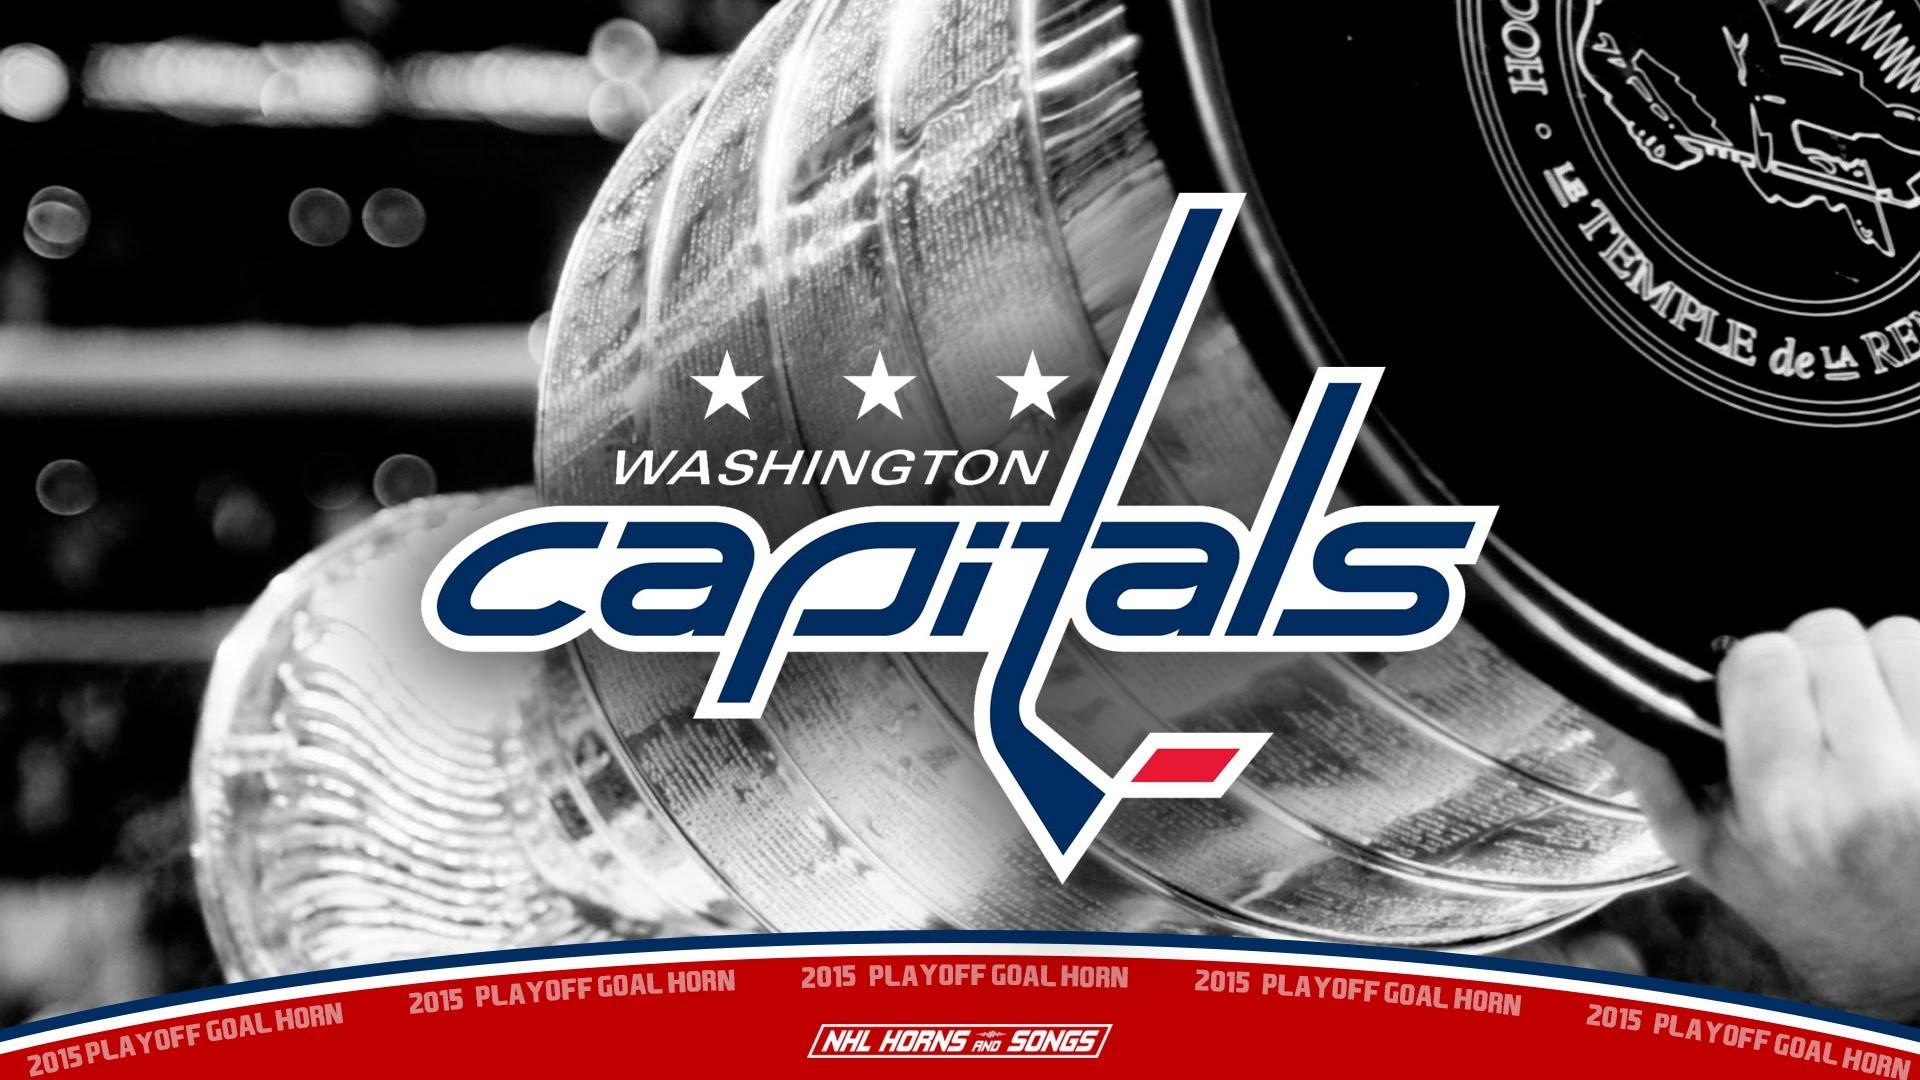 NHL Washington Capitals 2015 Playoff wallpaper HD. Free desktop .